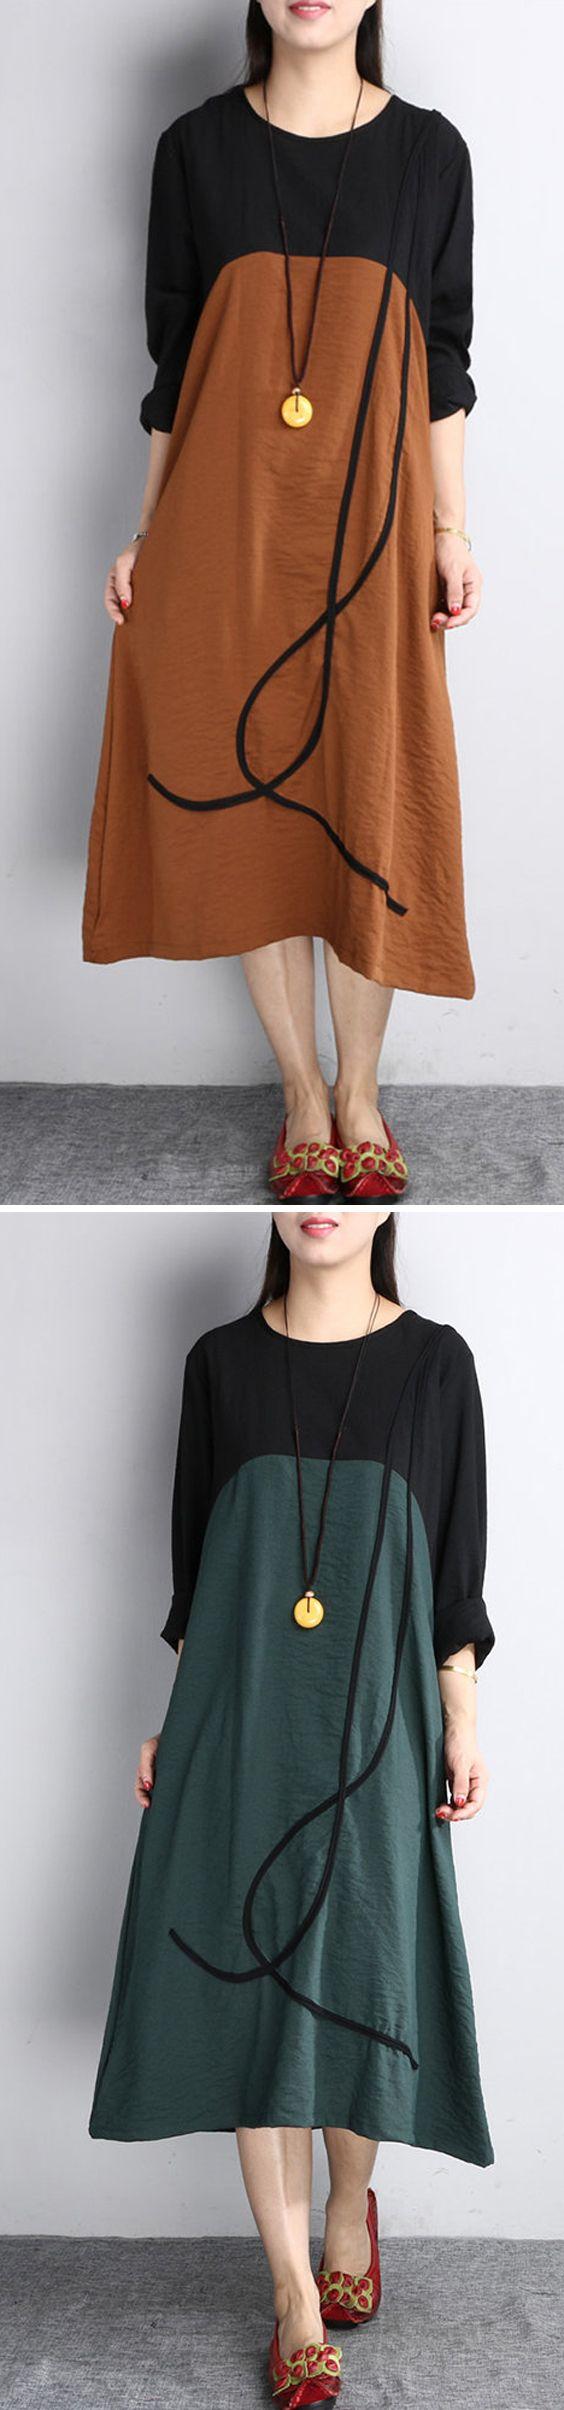 US$ 25.99 O-NEWE Vintage Splicing Line Printed Long Sleeves O Neck Dresses